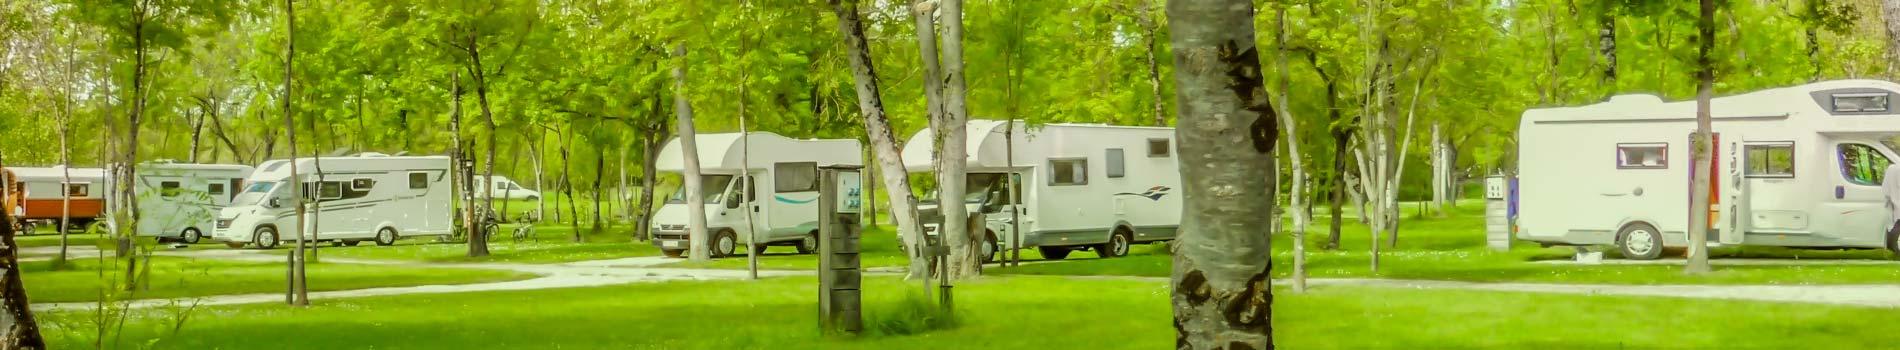 location emplacement camping vendée